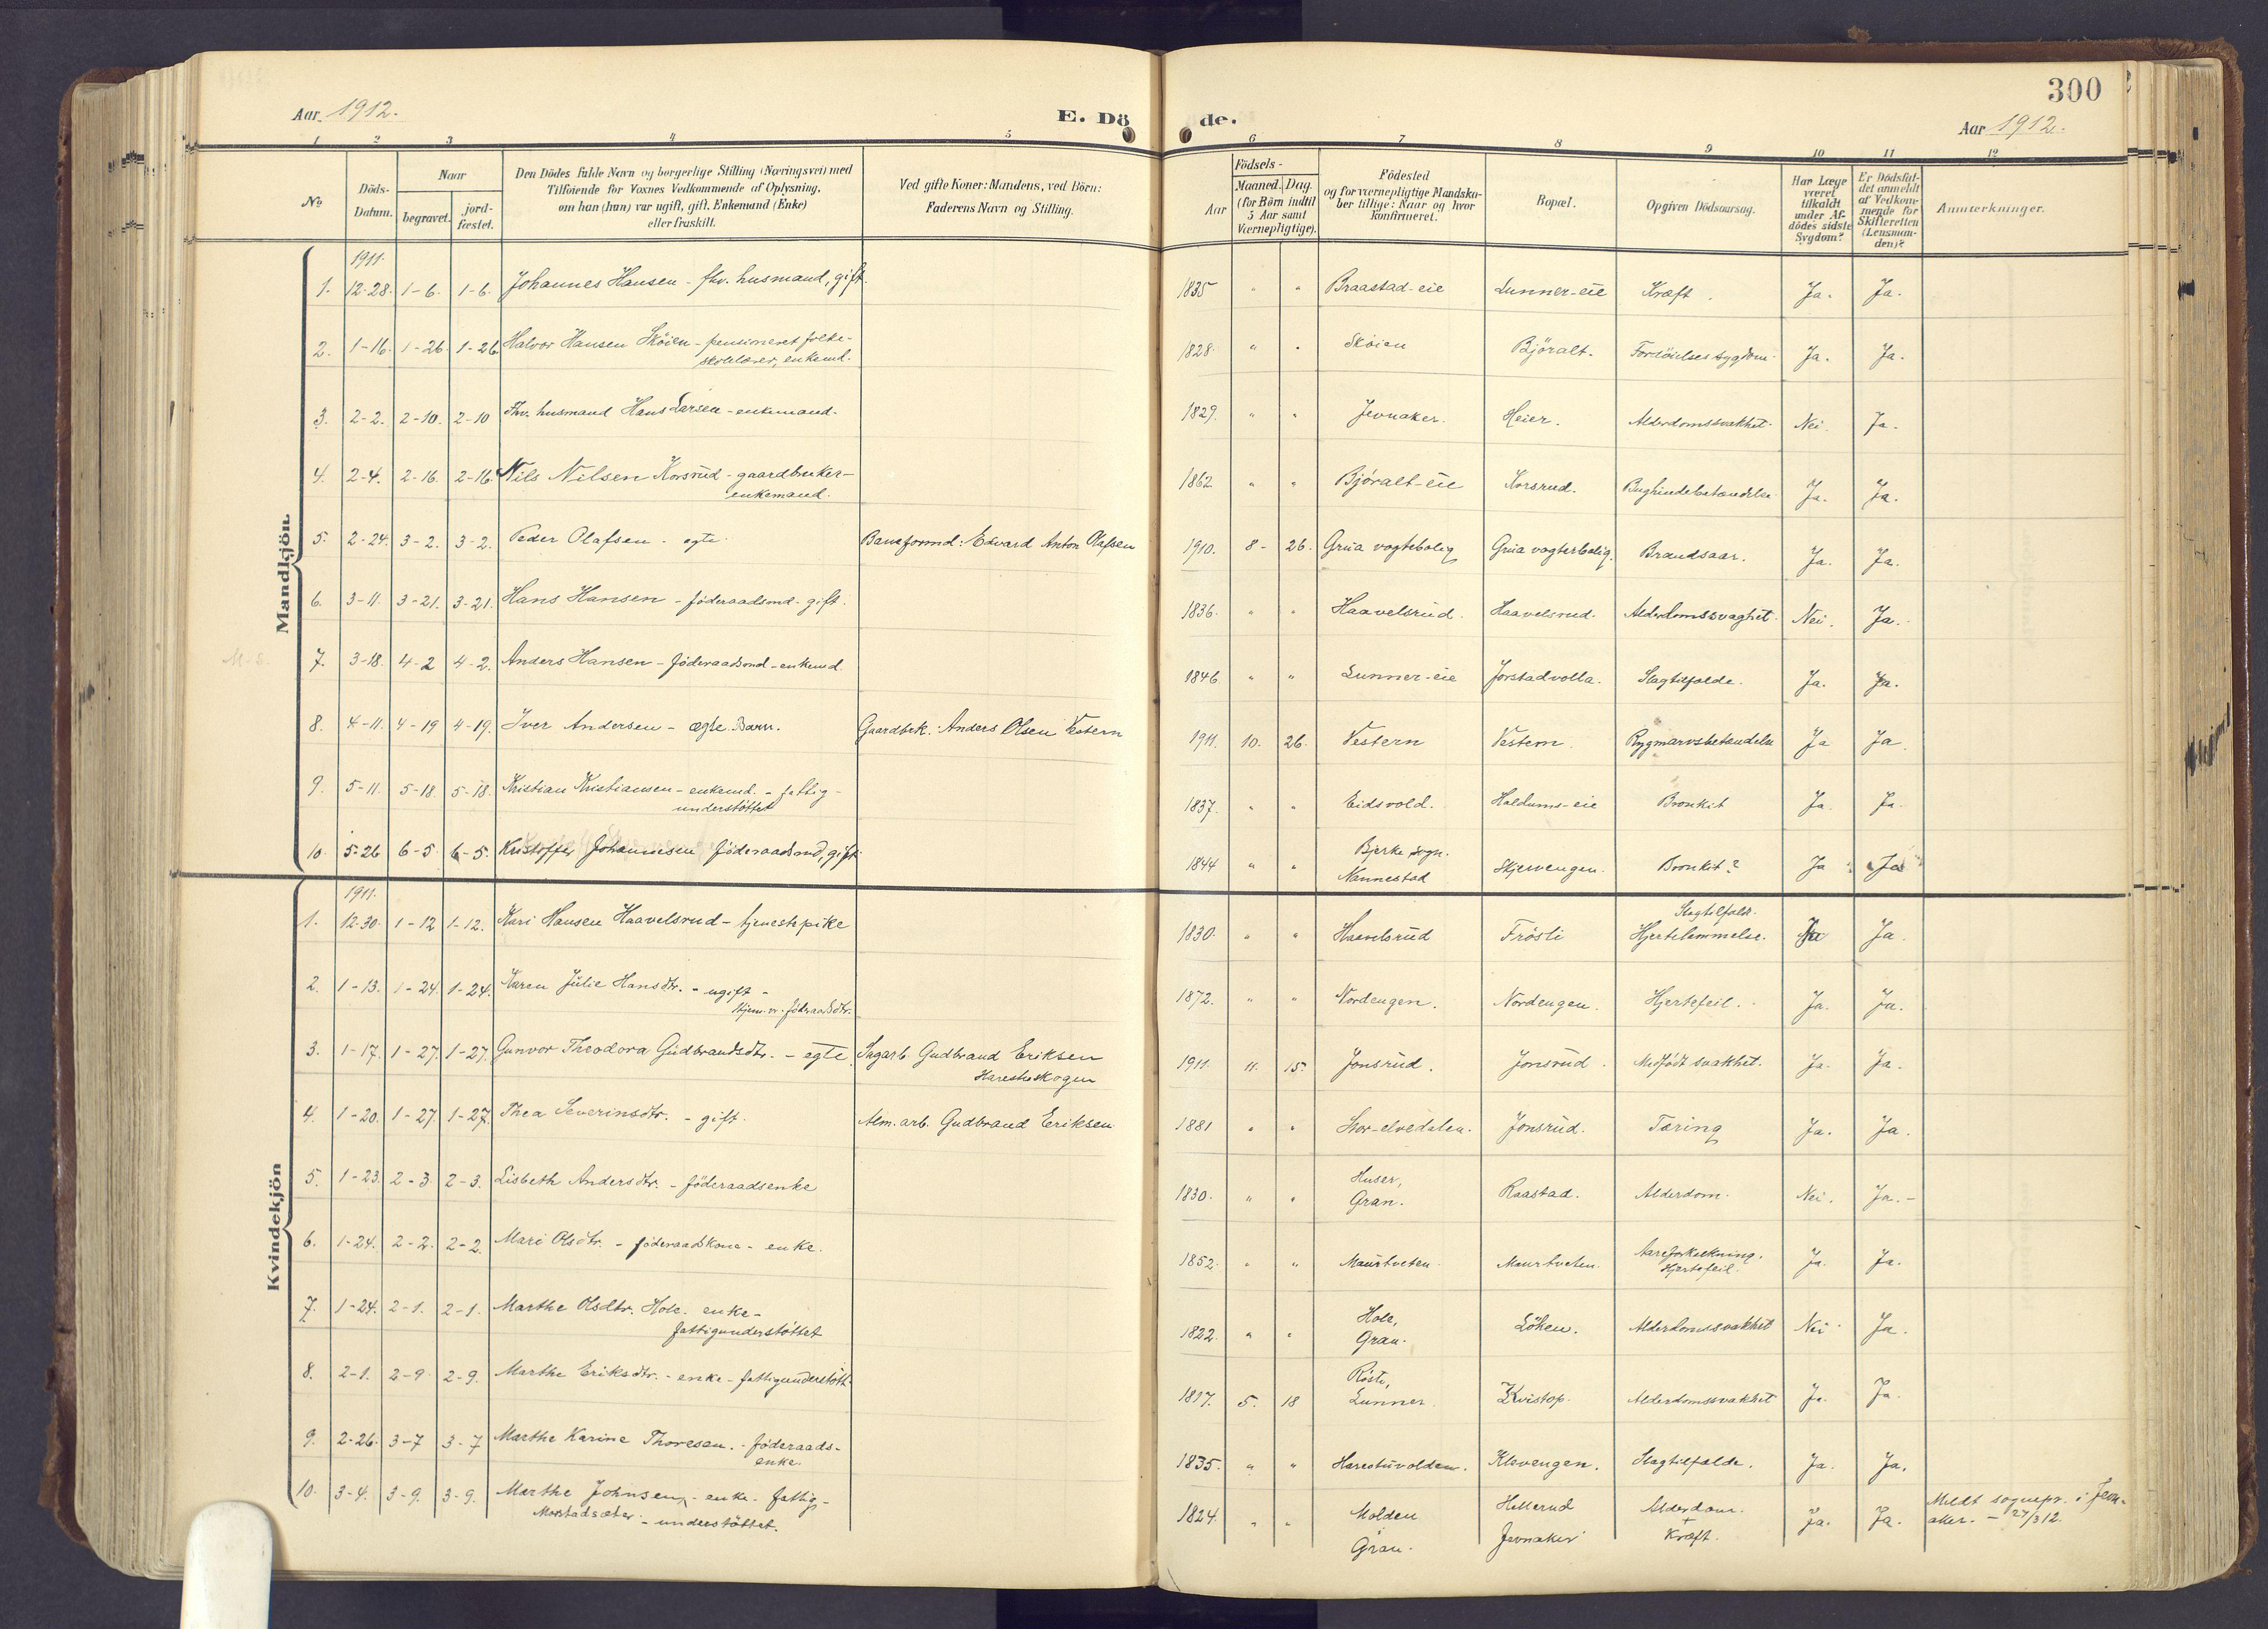 SAH, Lunner prestekontor, H/Ha/Haa/L0001: Ministerialbok nr. 1, 1907-1922, s. 300